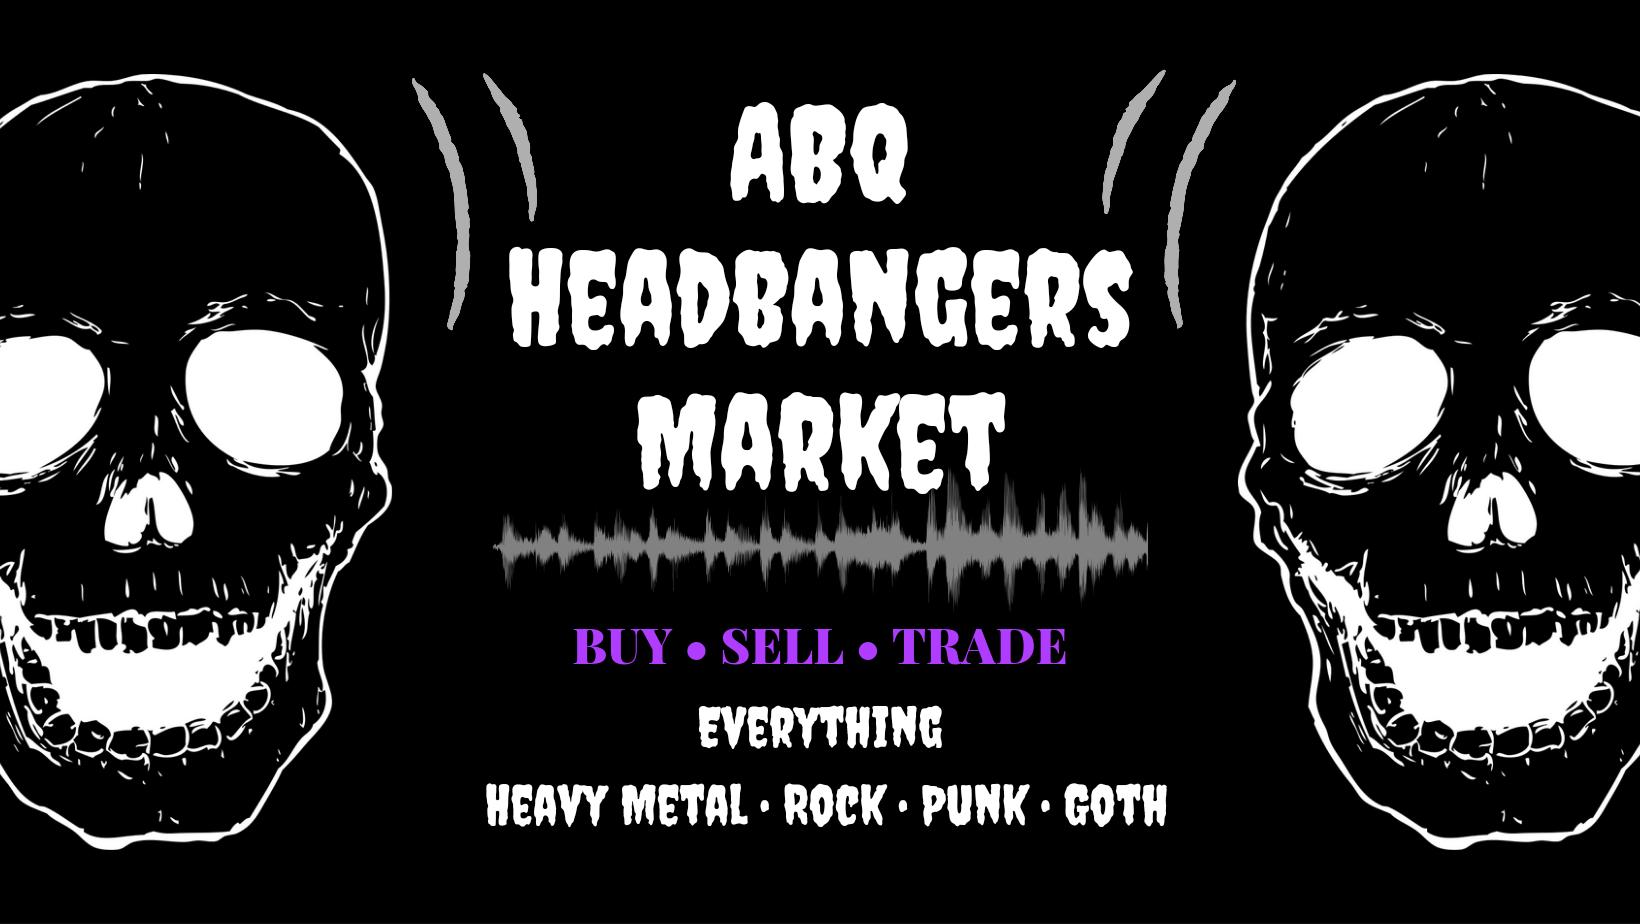 ABQ Headbangers Market